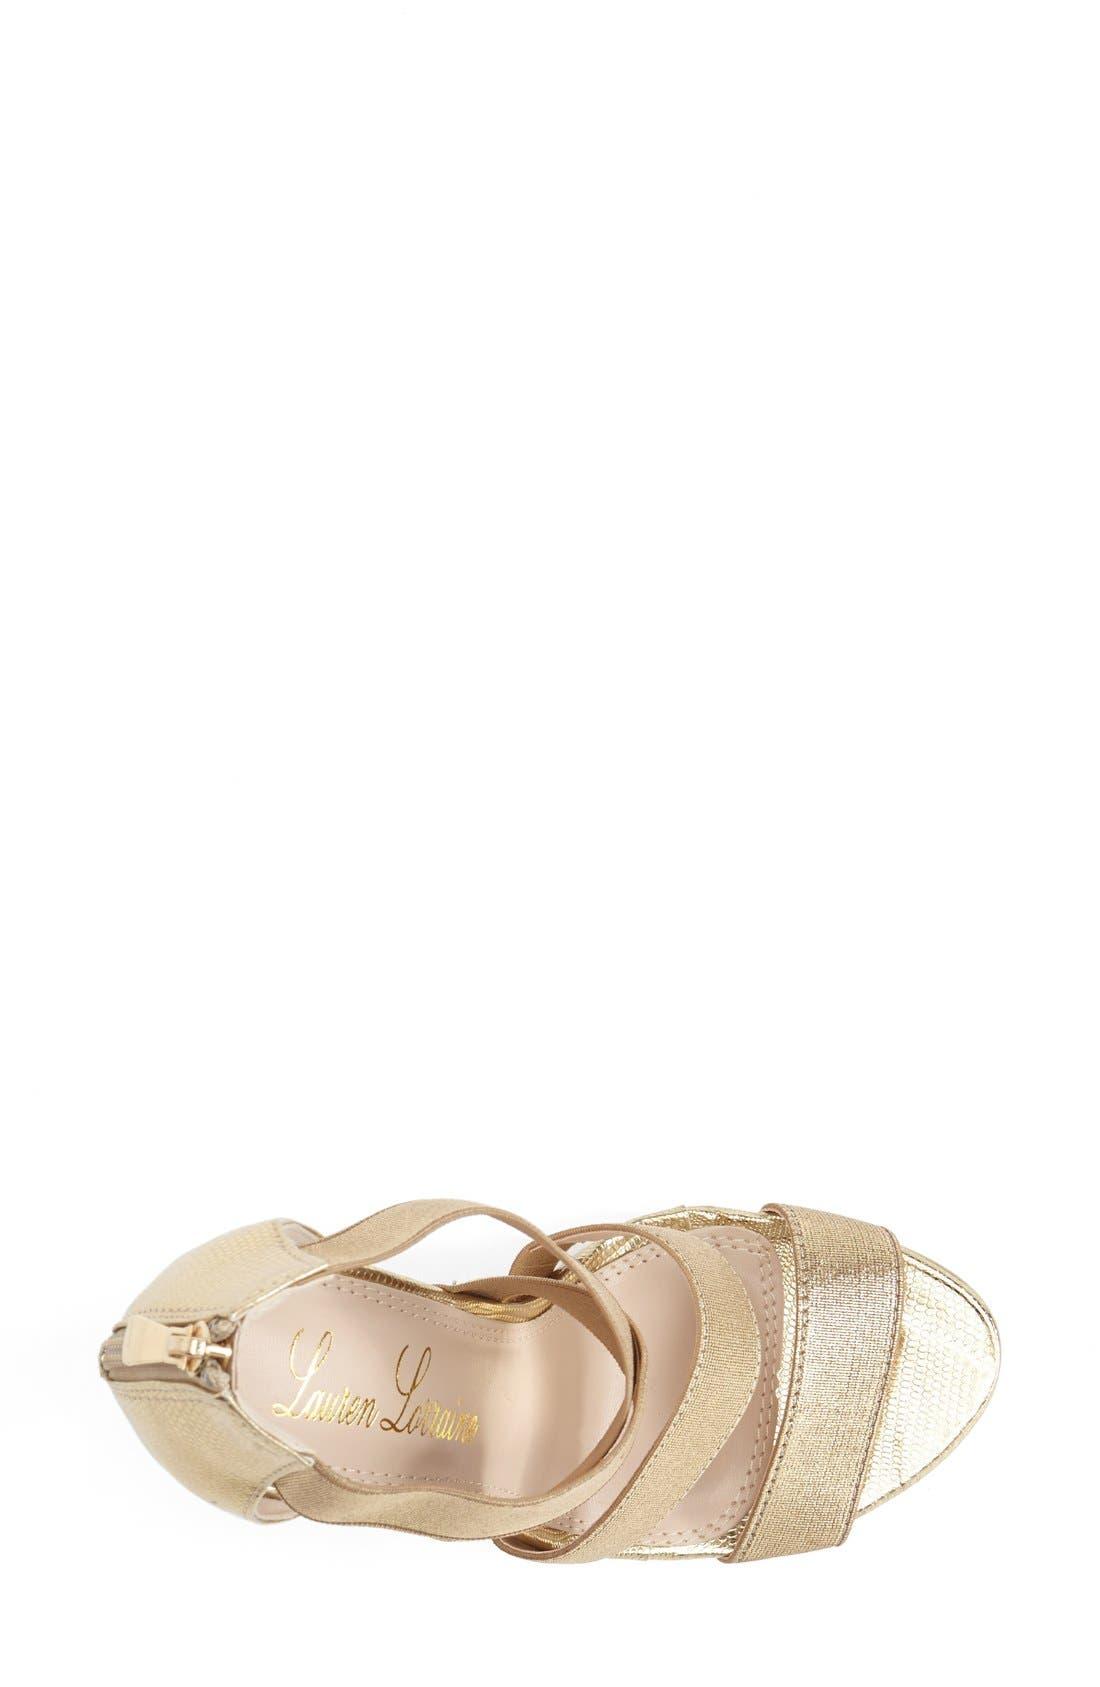 Alternate Image 3  - Lauren Lorraine 'Lipsy' Platform Sandal (Women)